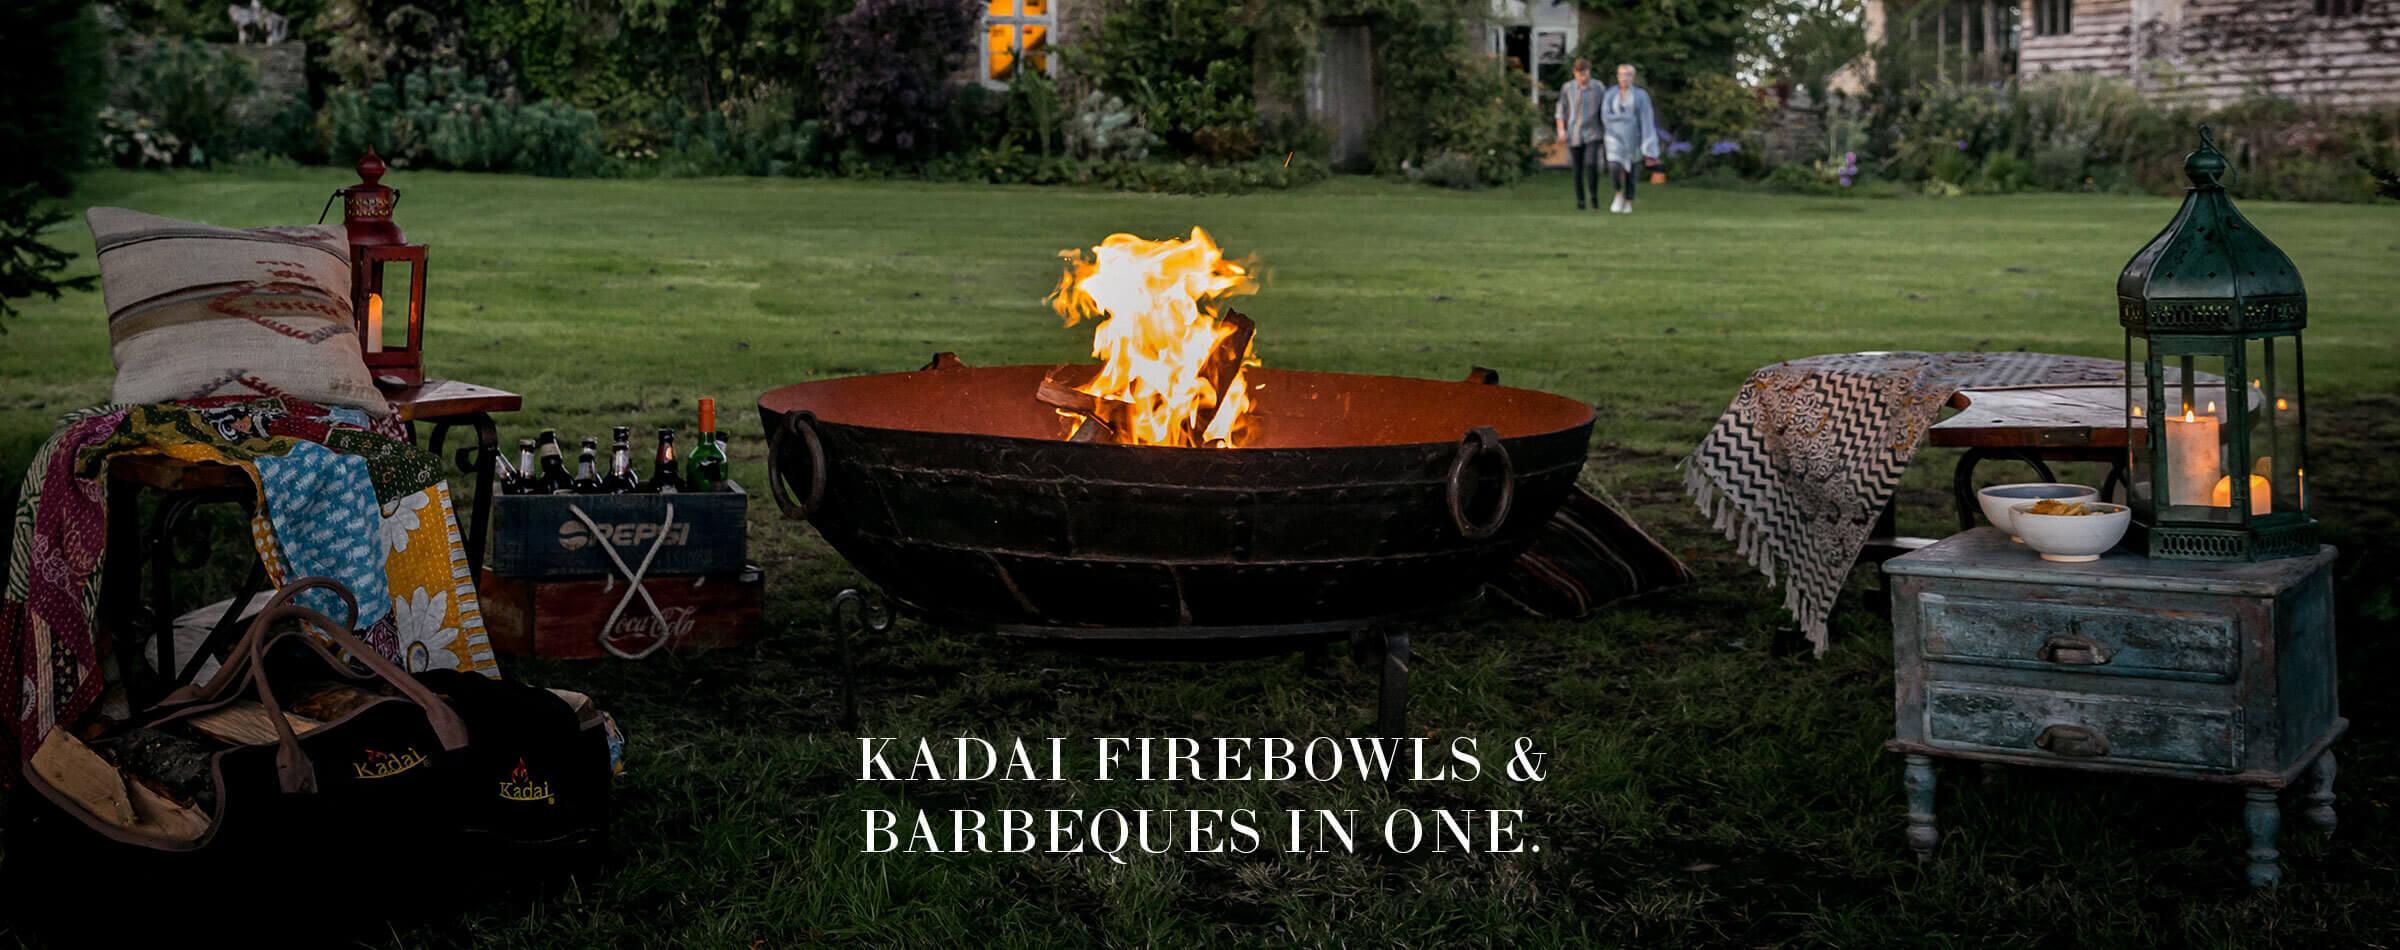 Kadai-Firebowls